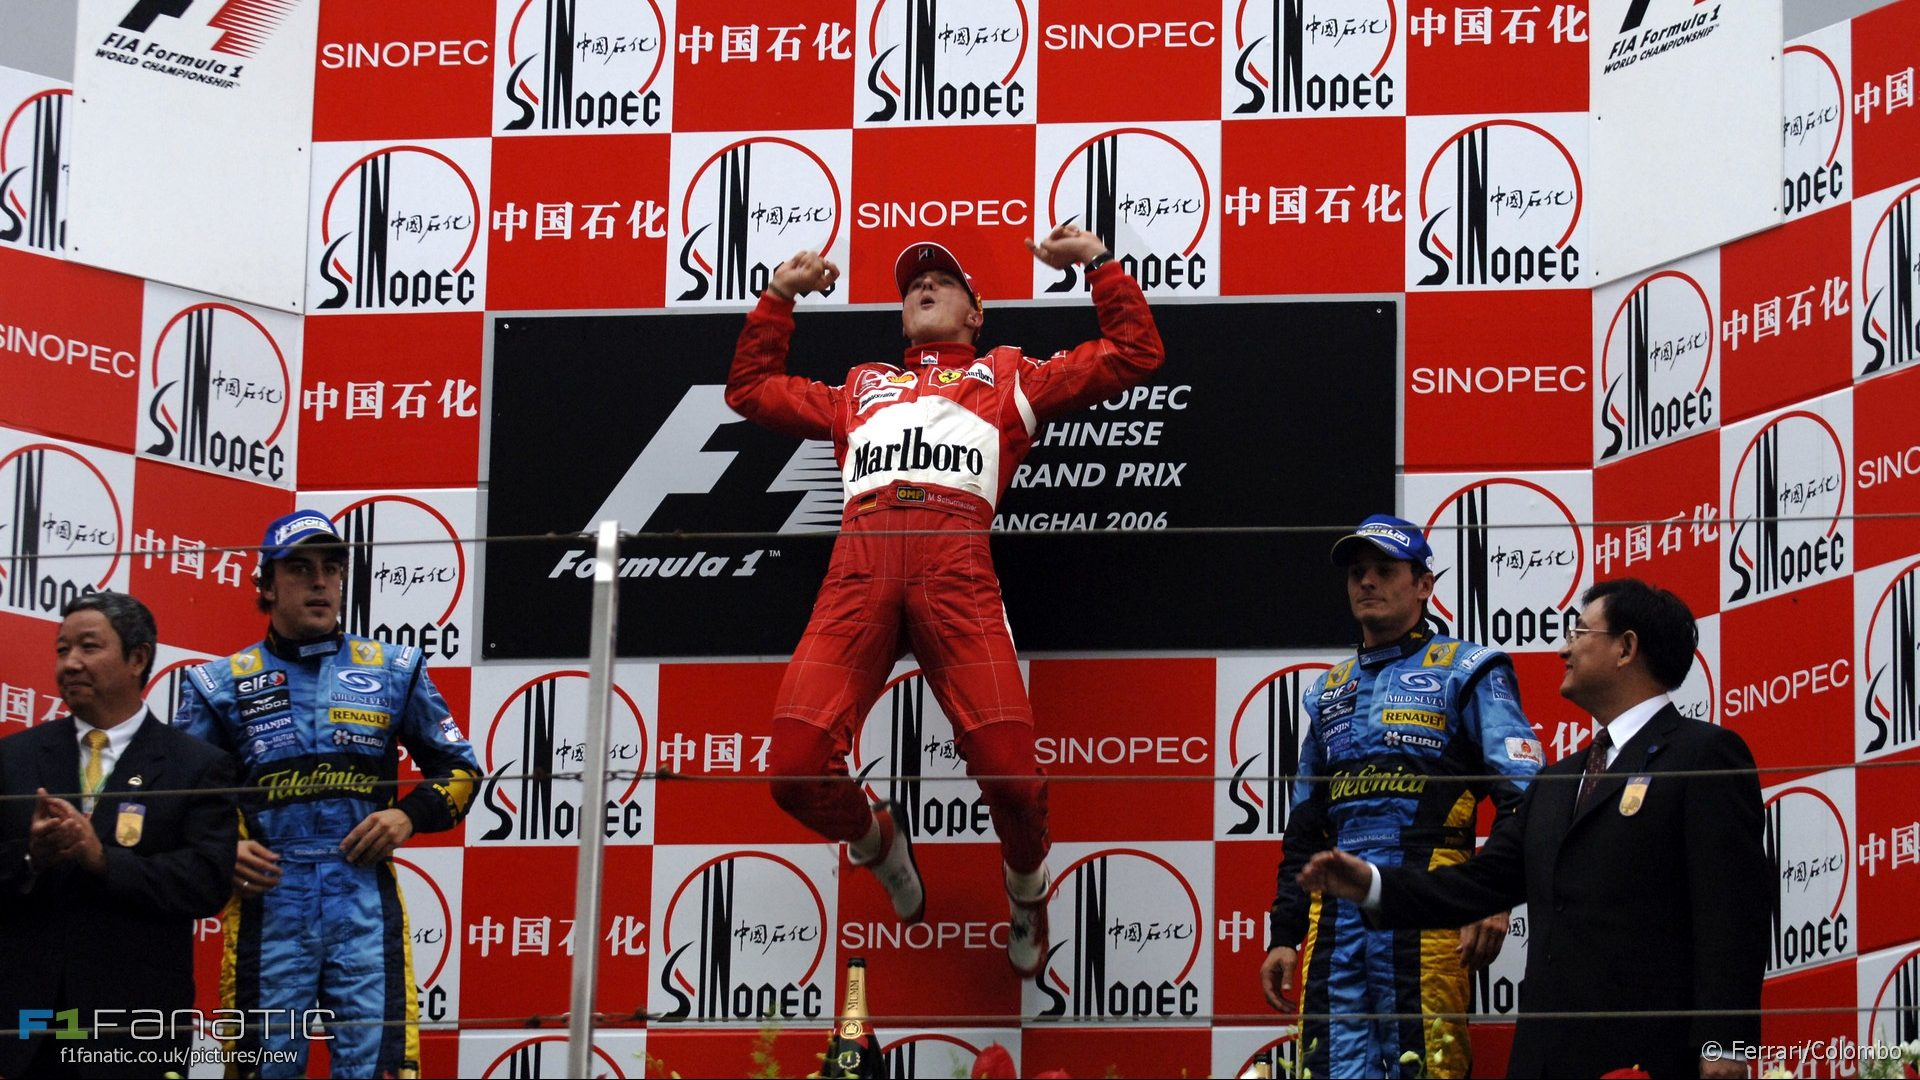 Fernando Alonso, Michael Schumacher, Giancarlo Fisichella, Shanghai, 2006